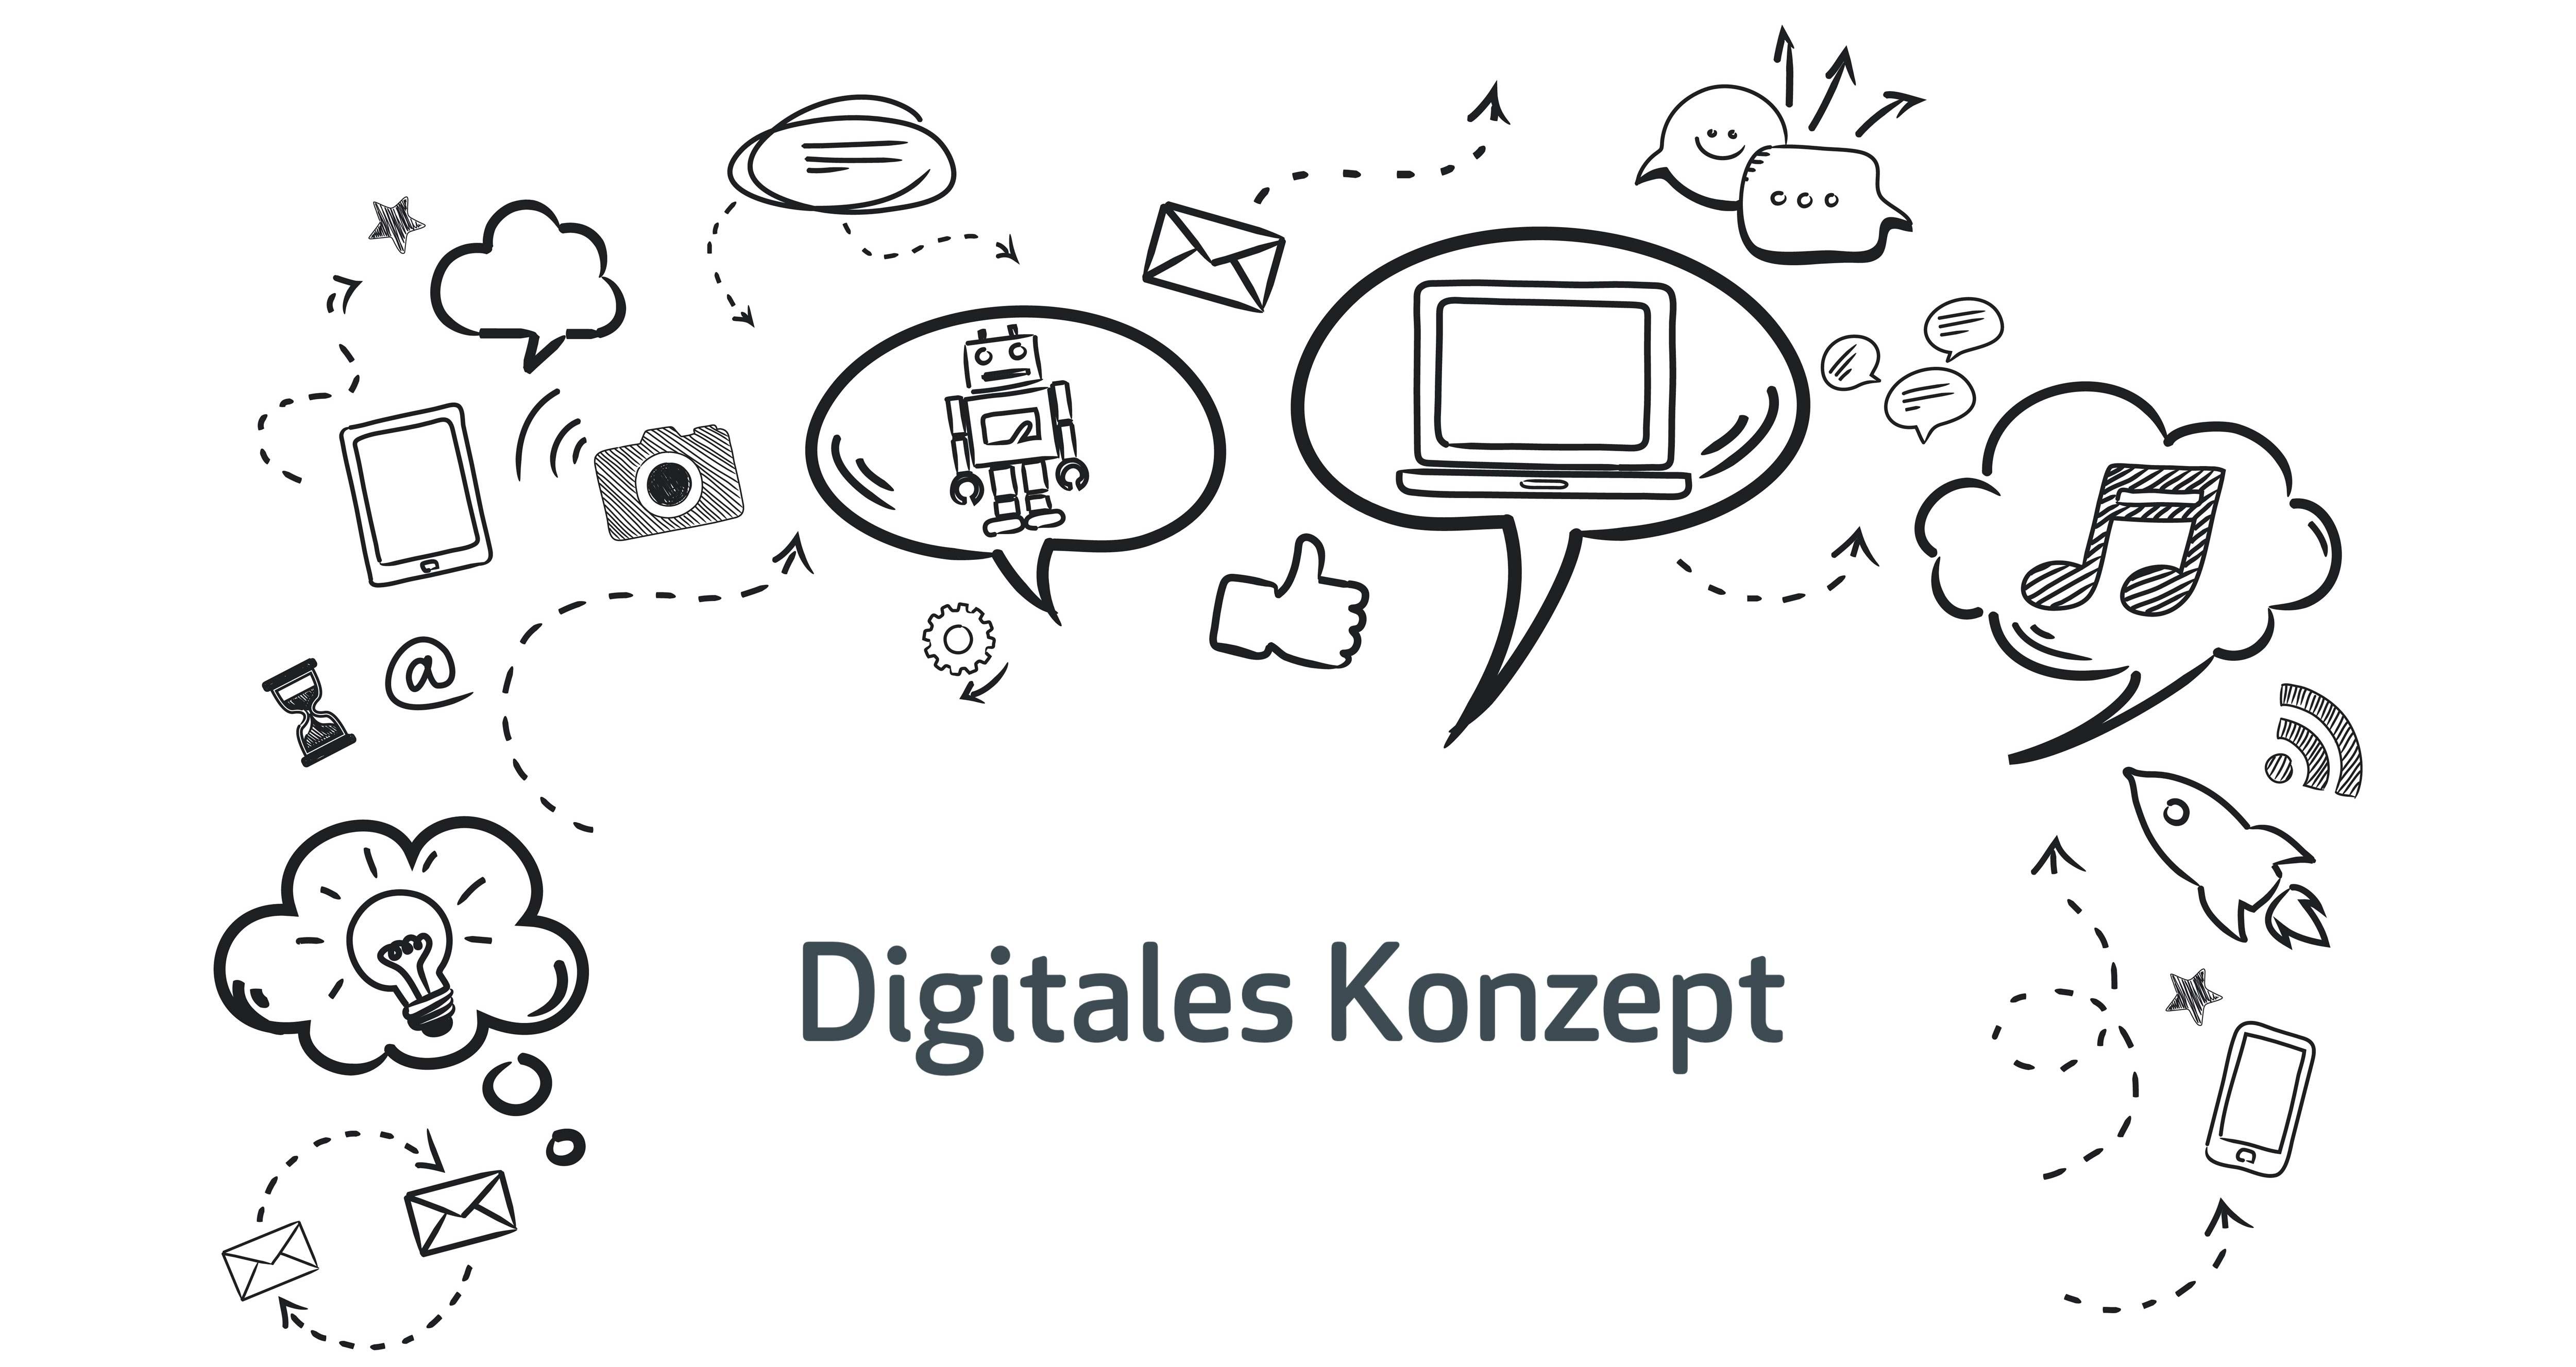 Digitales Konzept